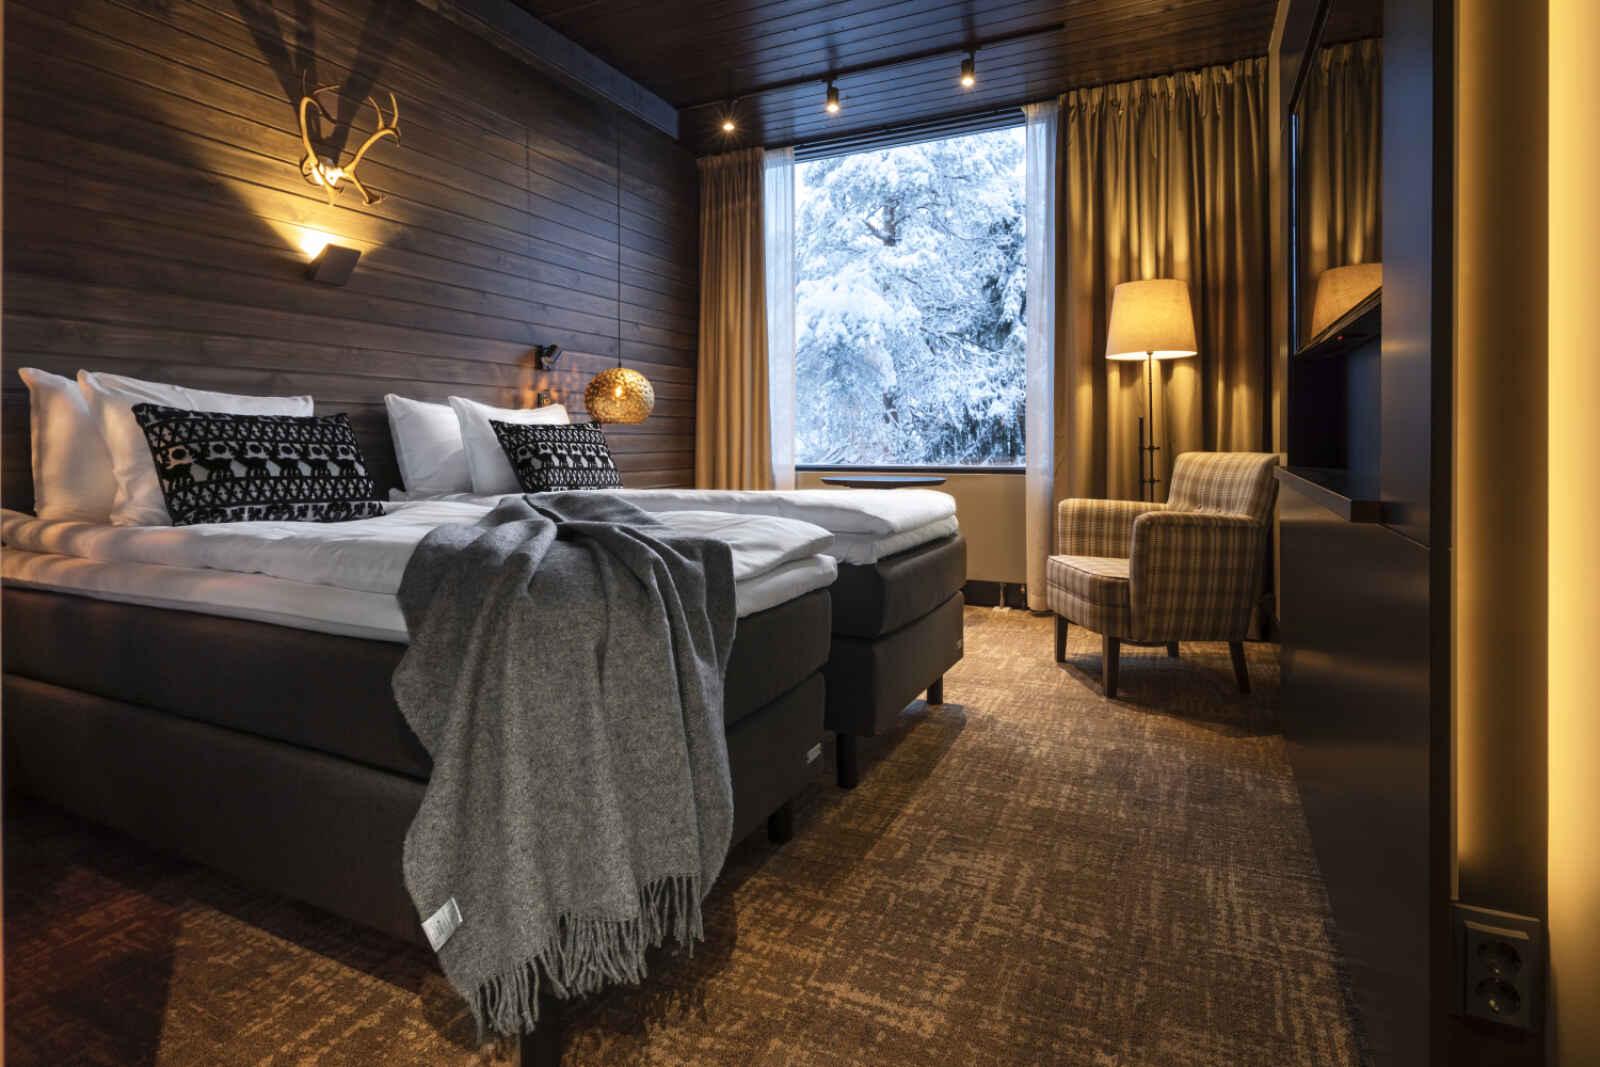 Finlande - Laponie - Rovaniemi - Hôtel Sky Ounasvaara